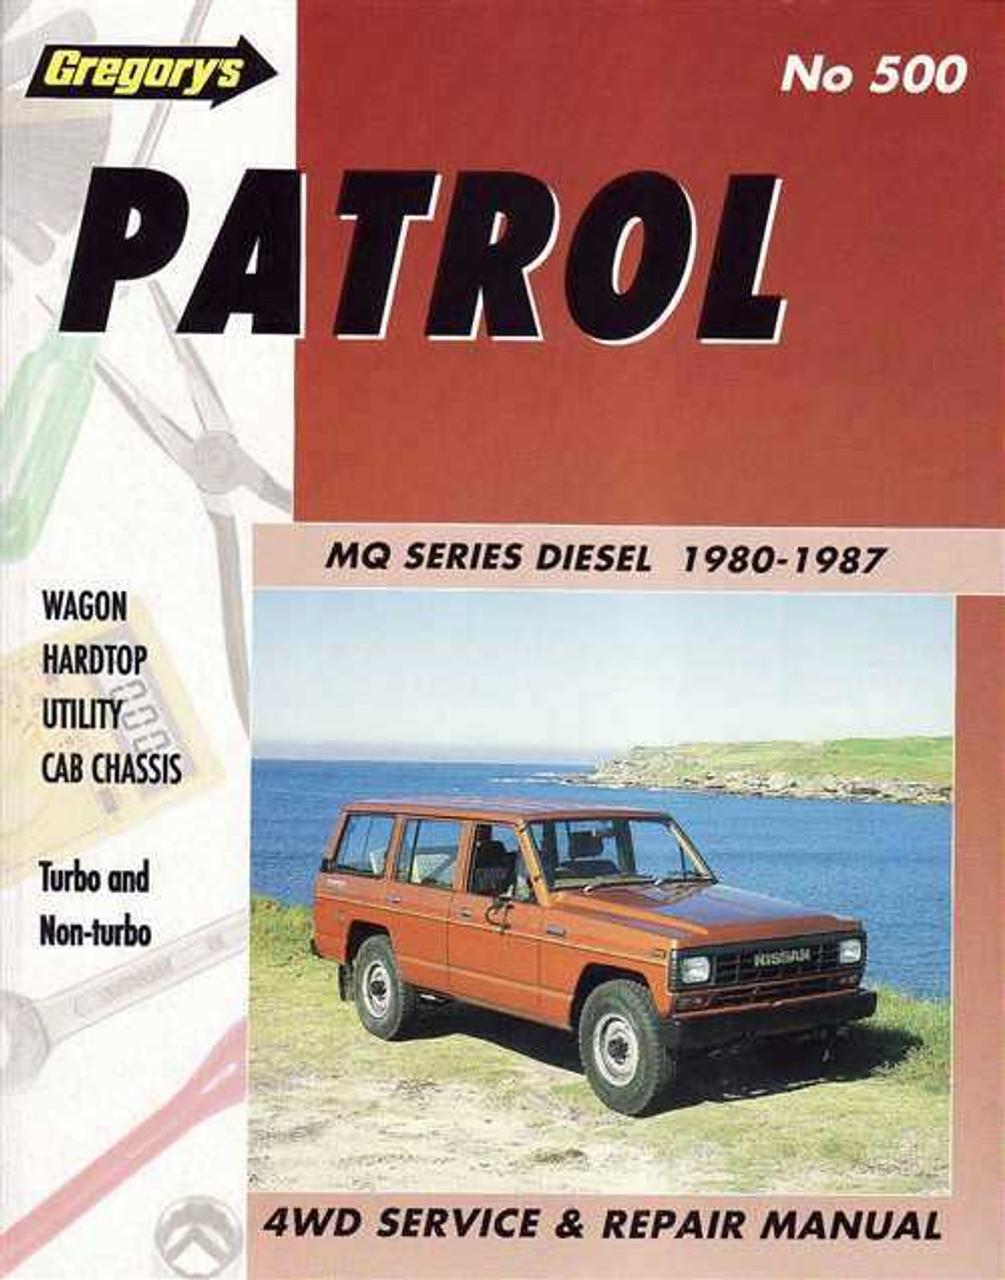 nissan patrol mq series 1980 1987 workshop manual rh automotobookshop com au Nissan CR Engine manual nissan patrol rd28t